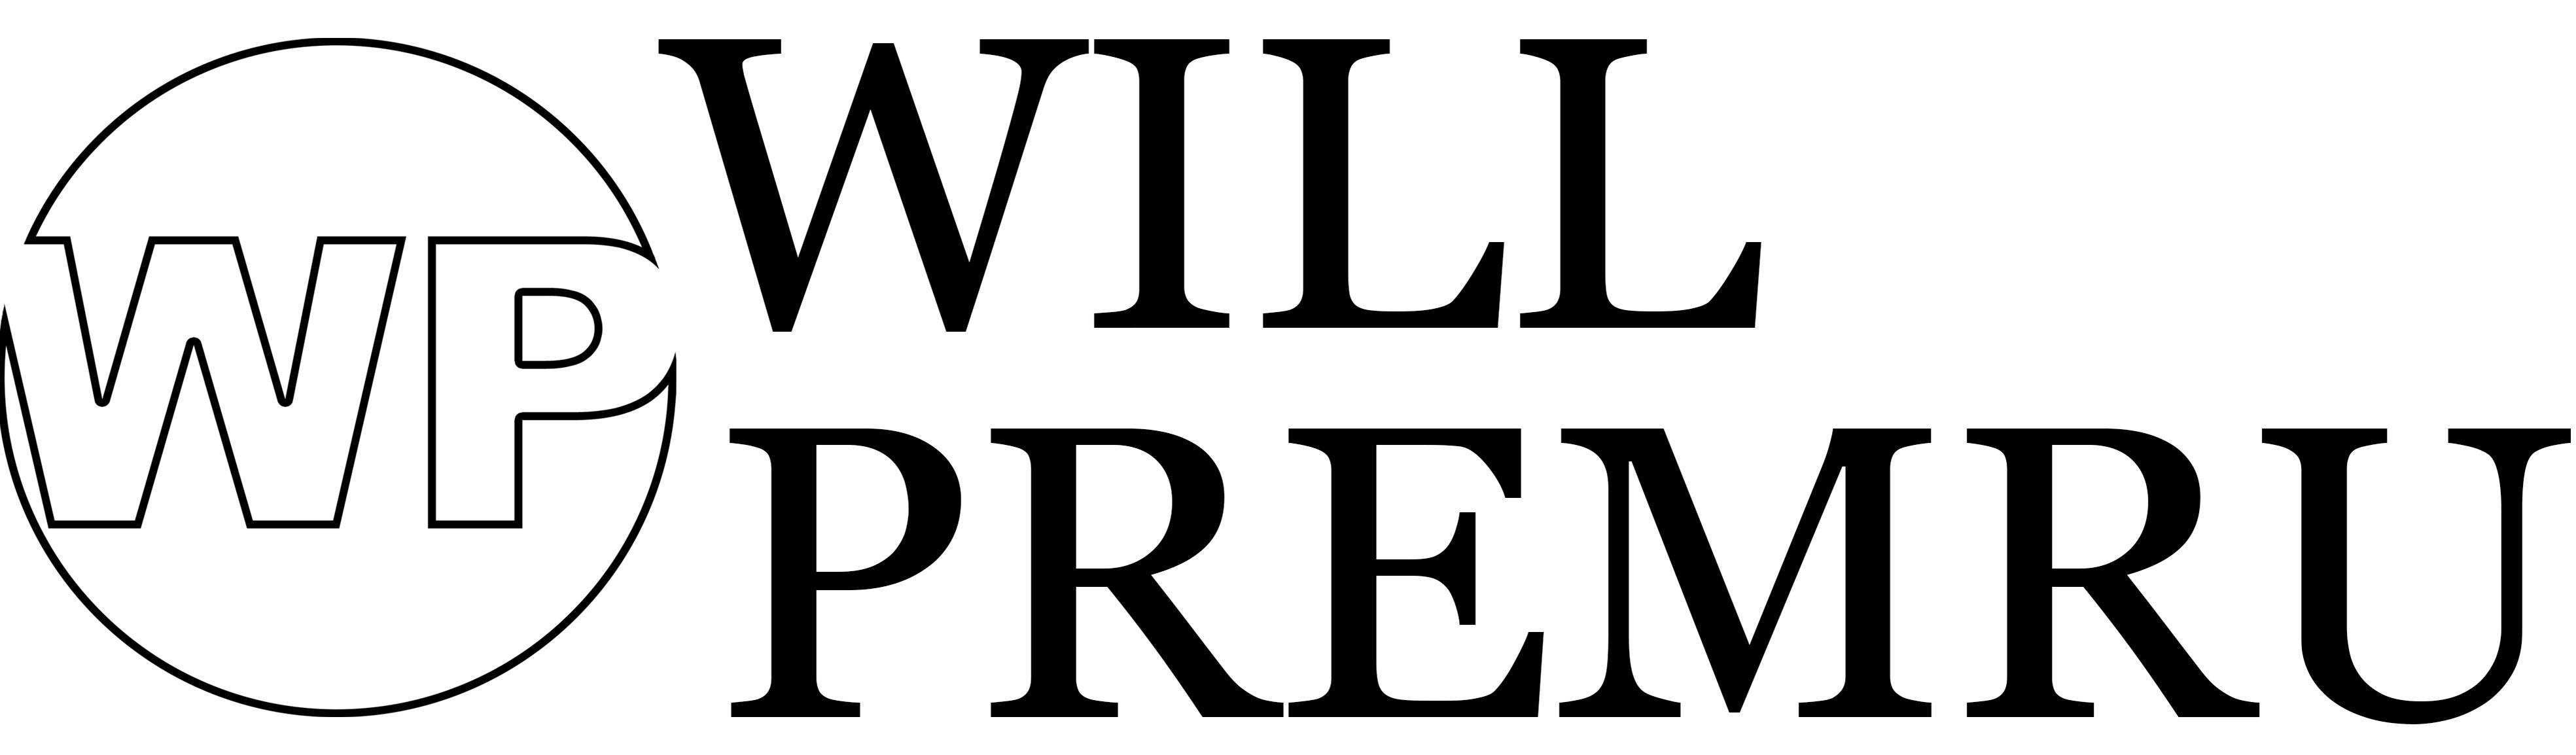 Will Premru